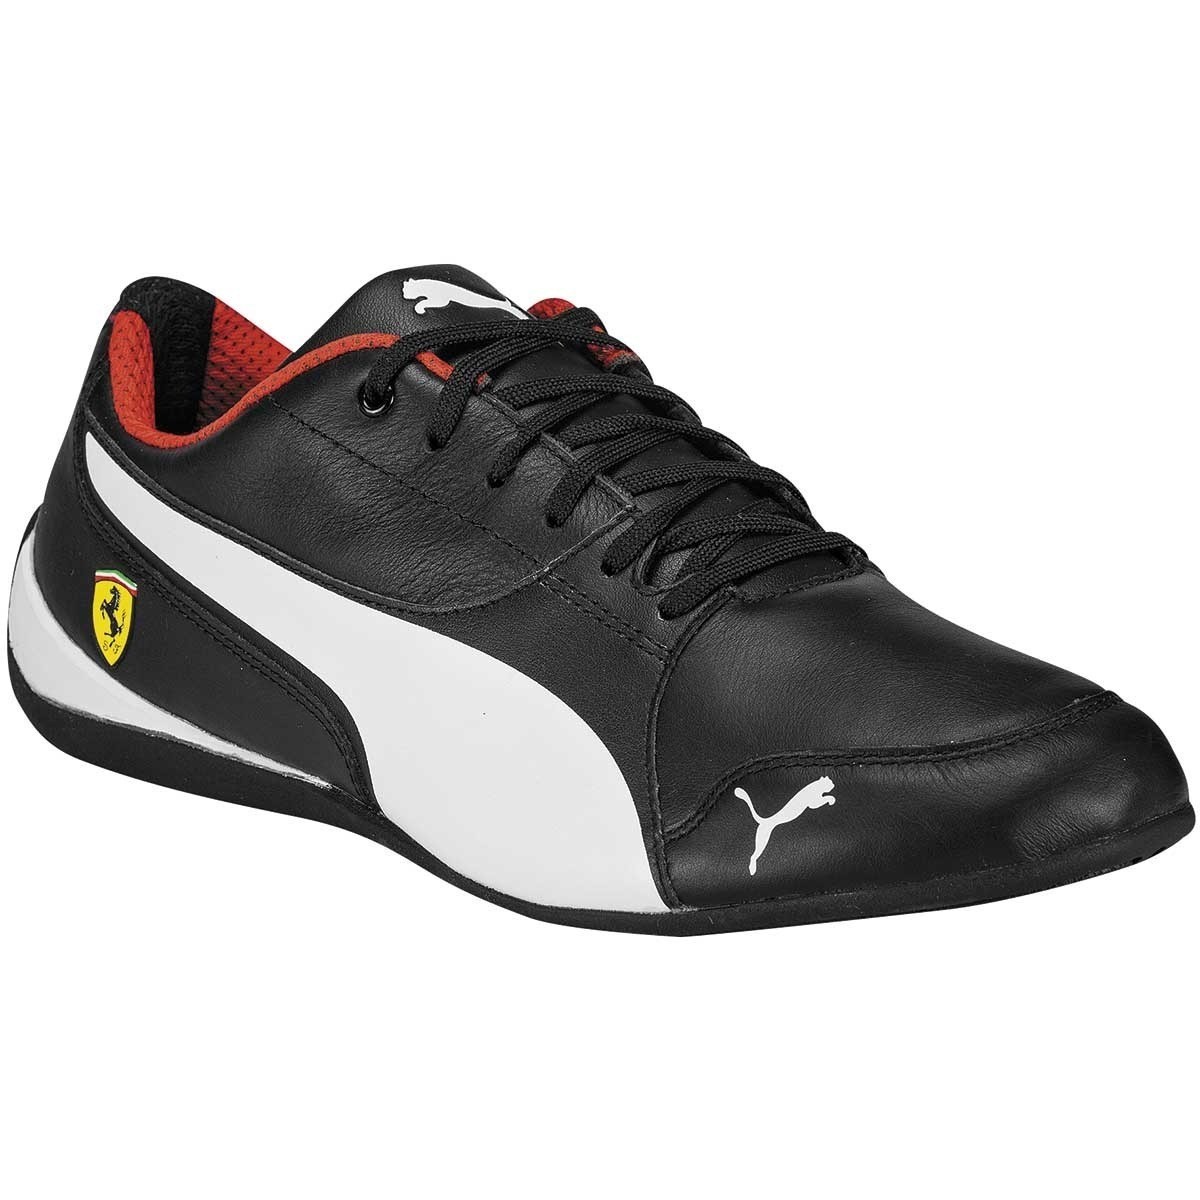 bcb36e3058b9a tenis puma ferrari drift cat 7 trainers negros hombre orignl. Cargando zoom.